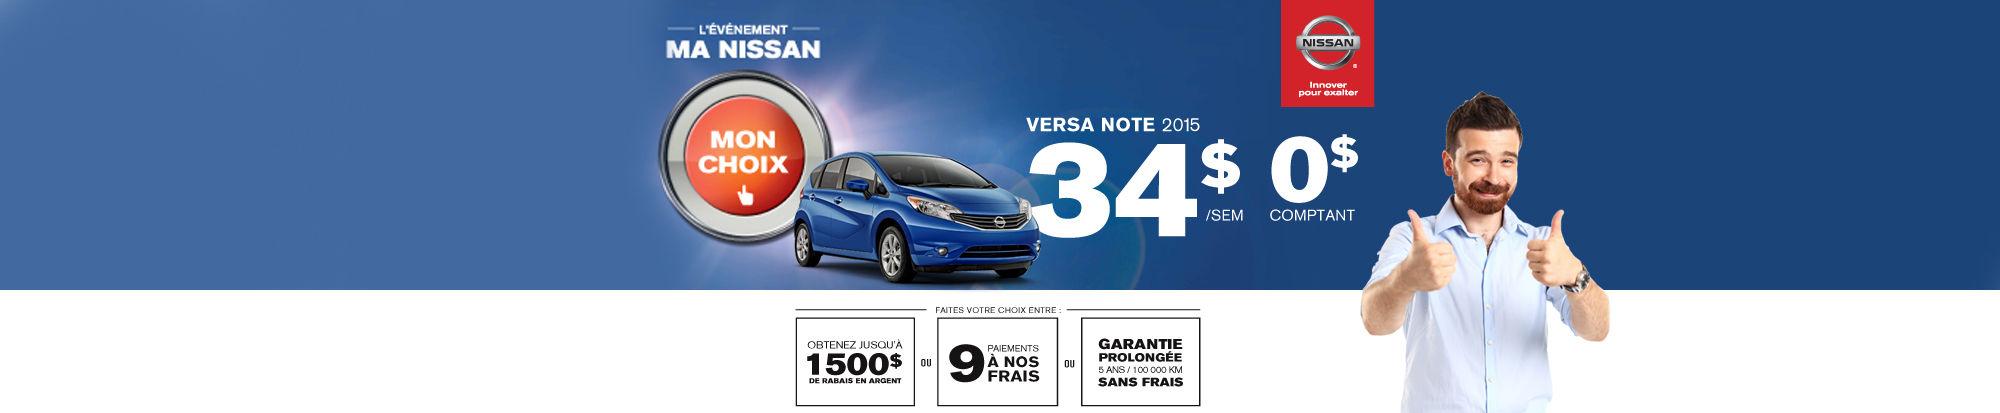 Nissan Versa note juin